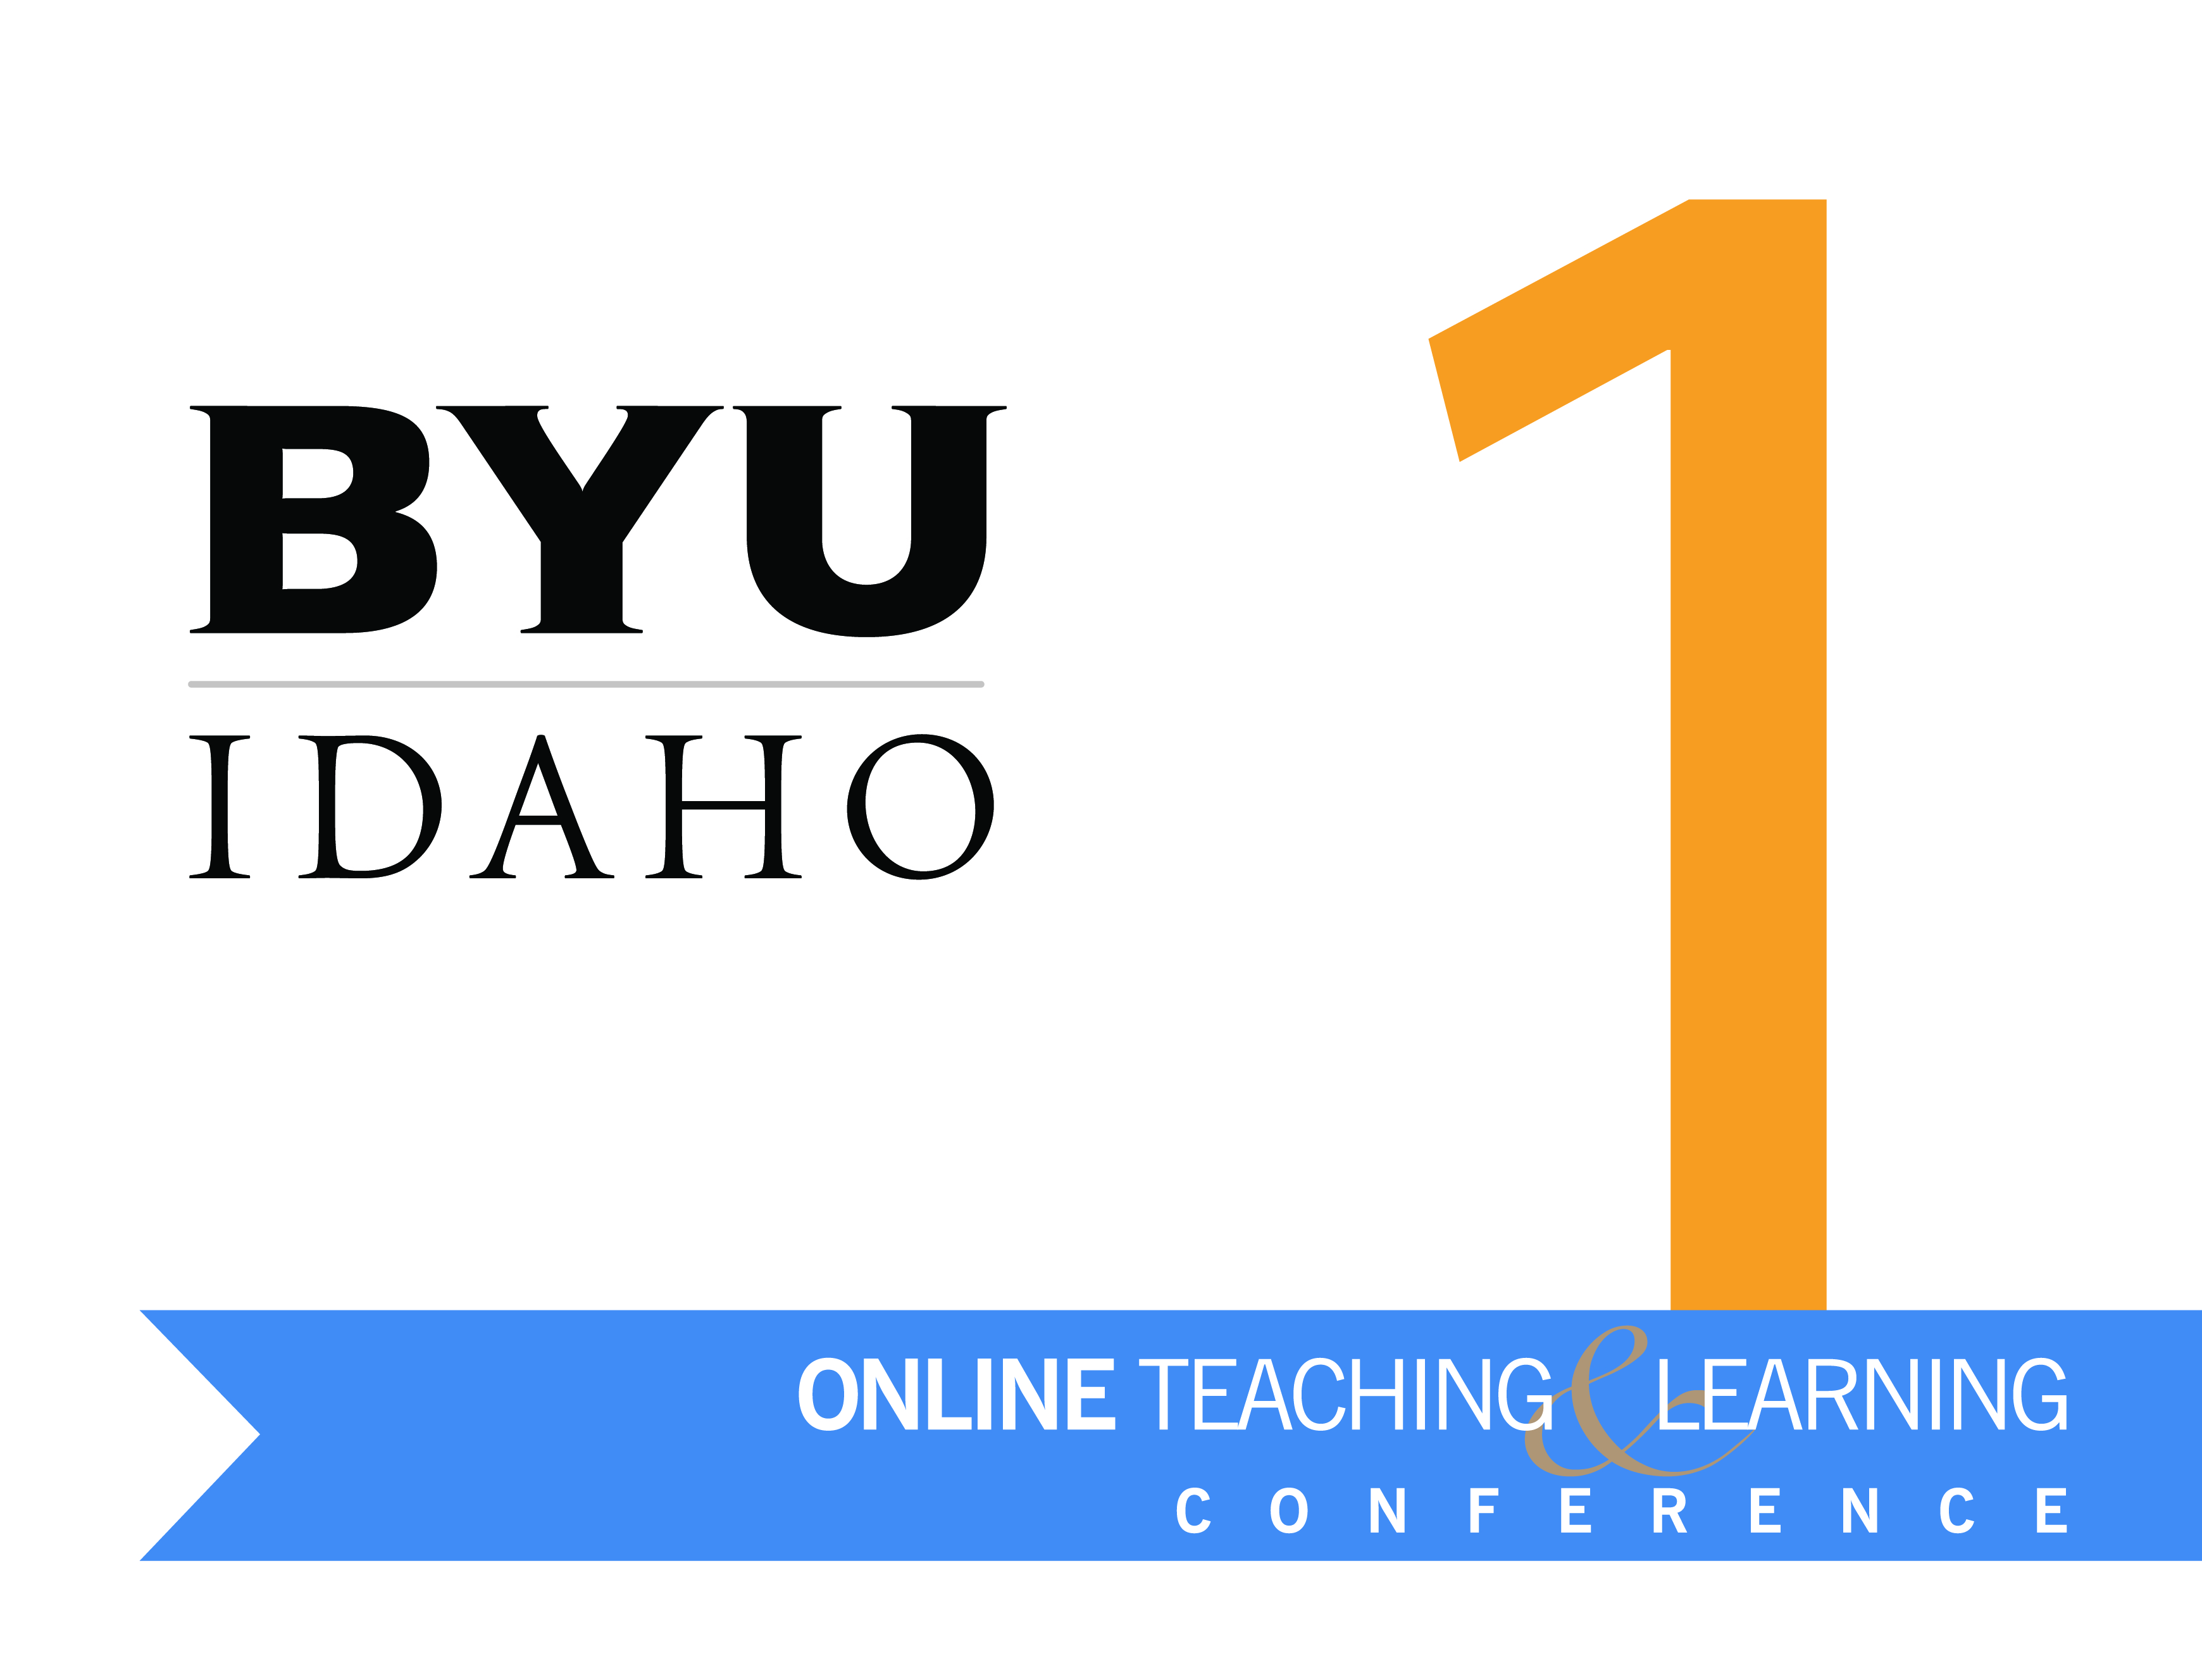 BYUI Online Conference Van Magnets